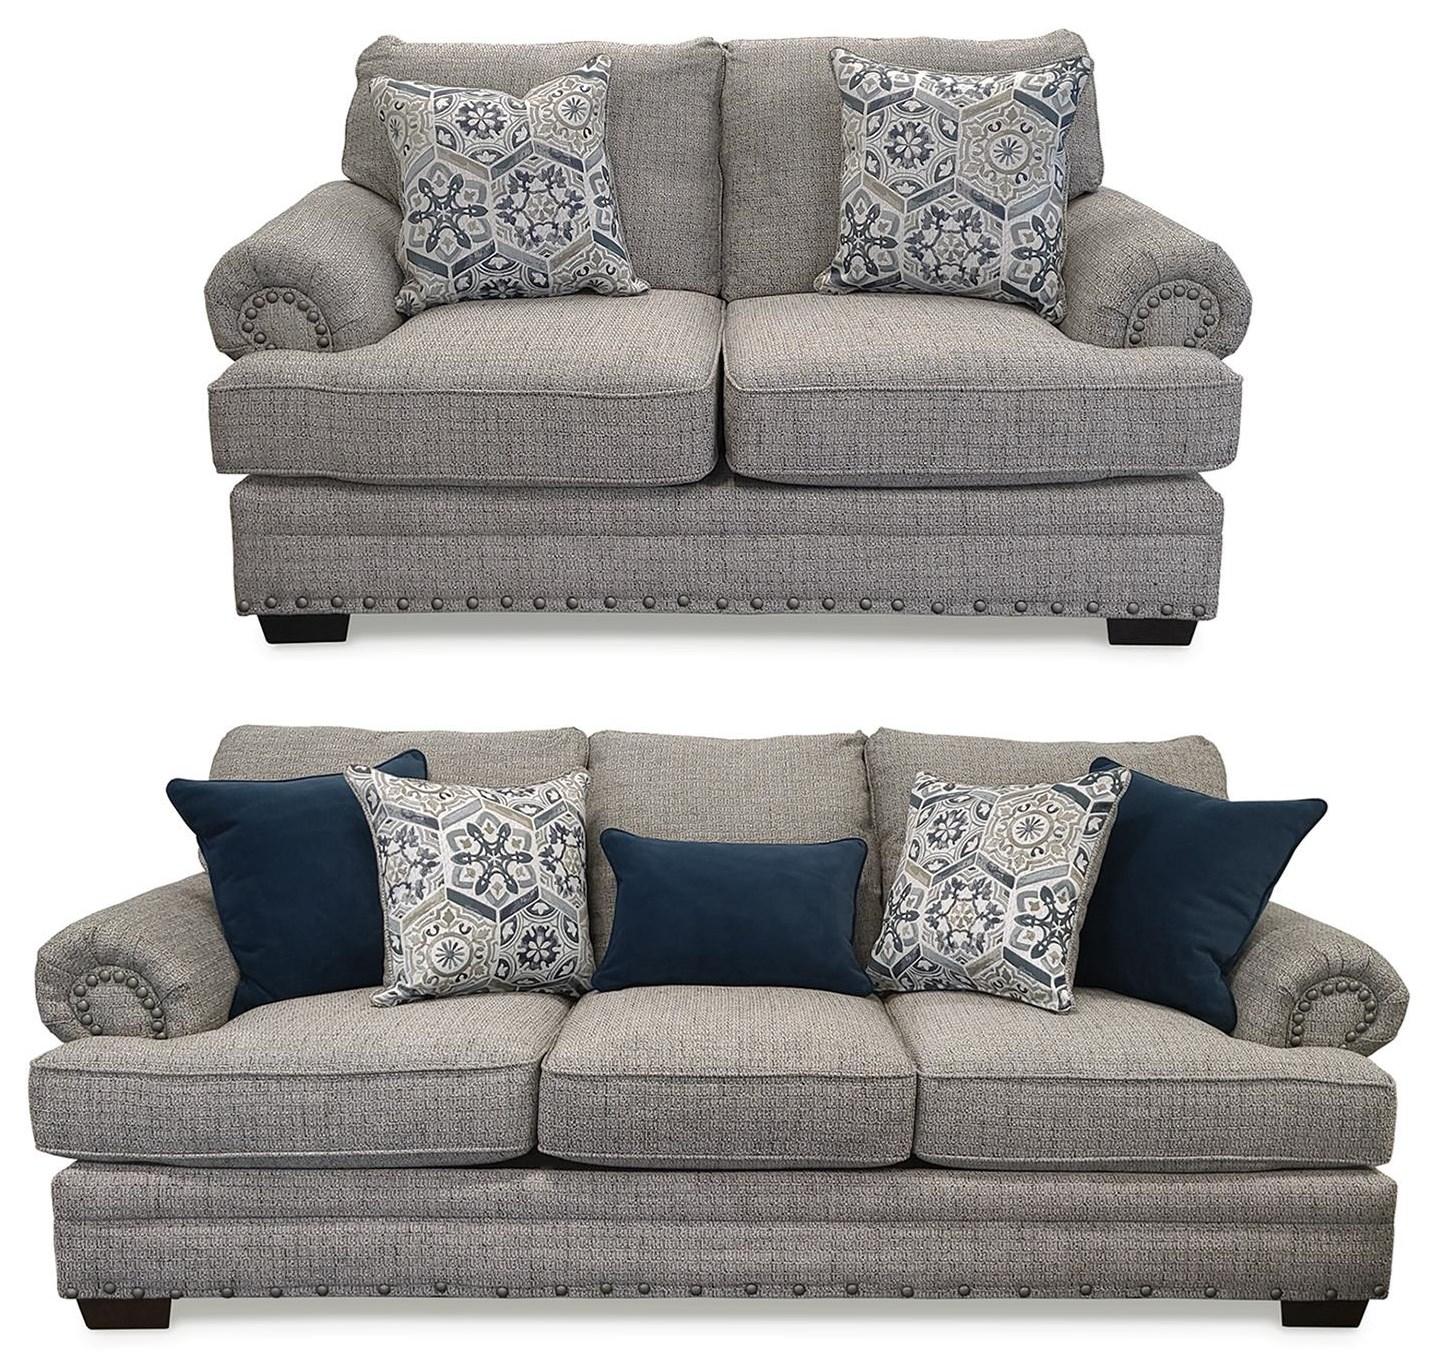 Columbia 2PC Sofa & Loveseat Set at Rotmans